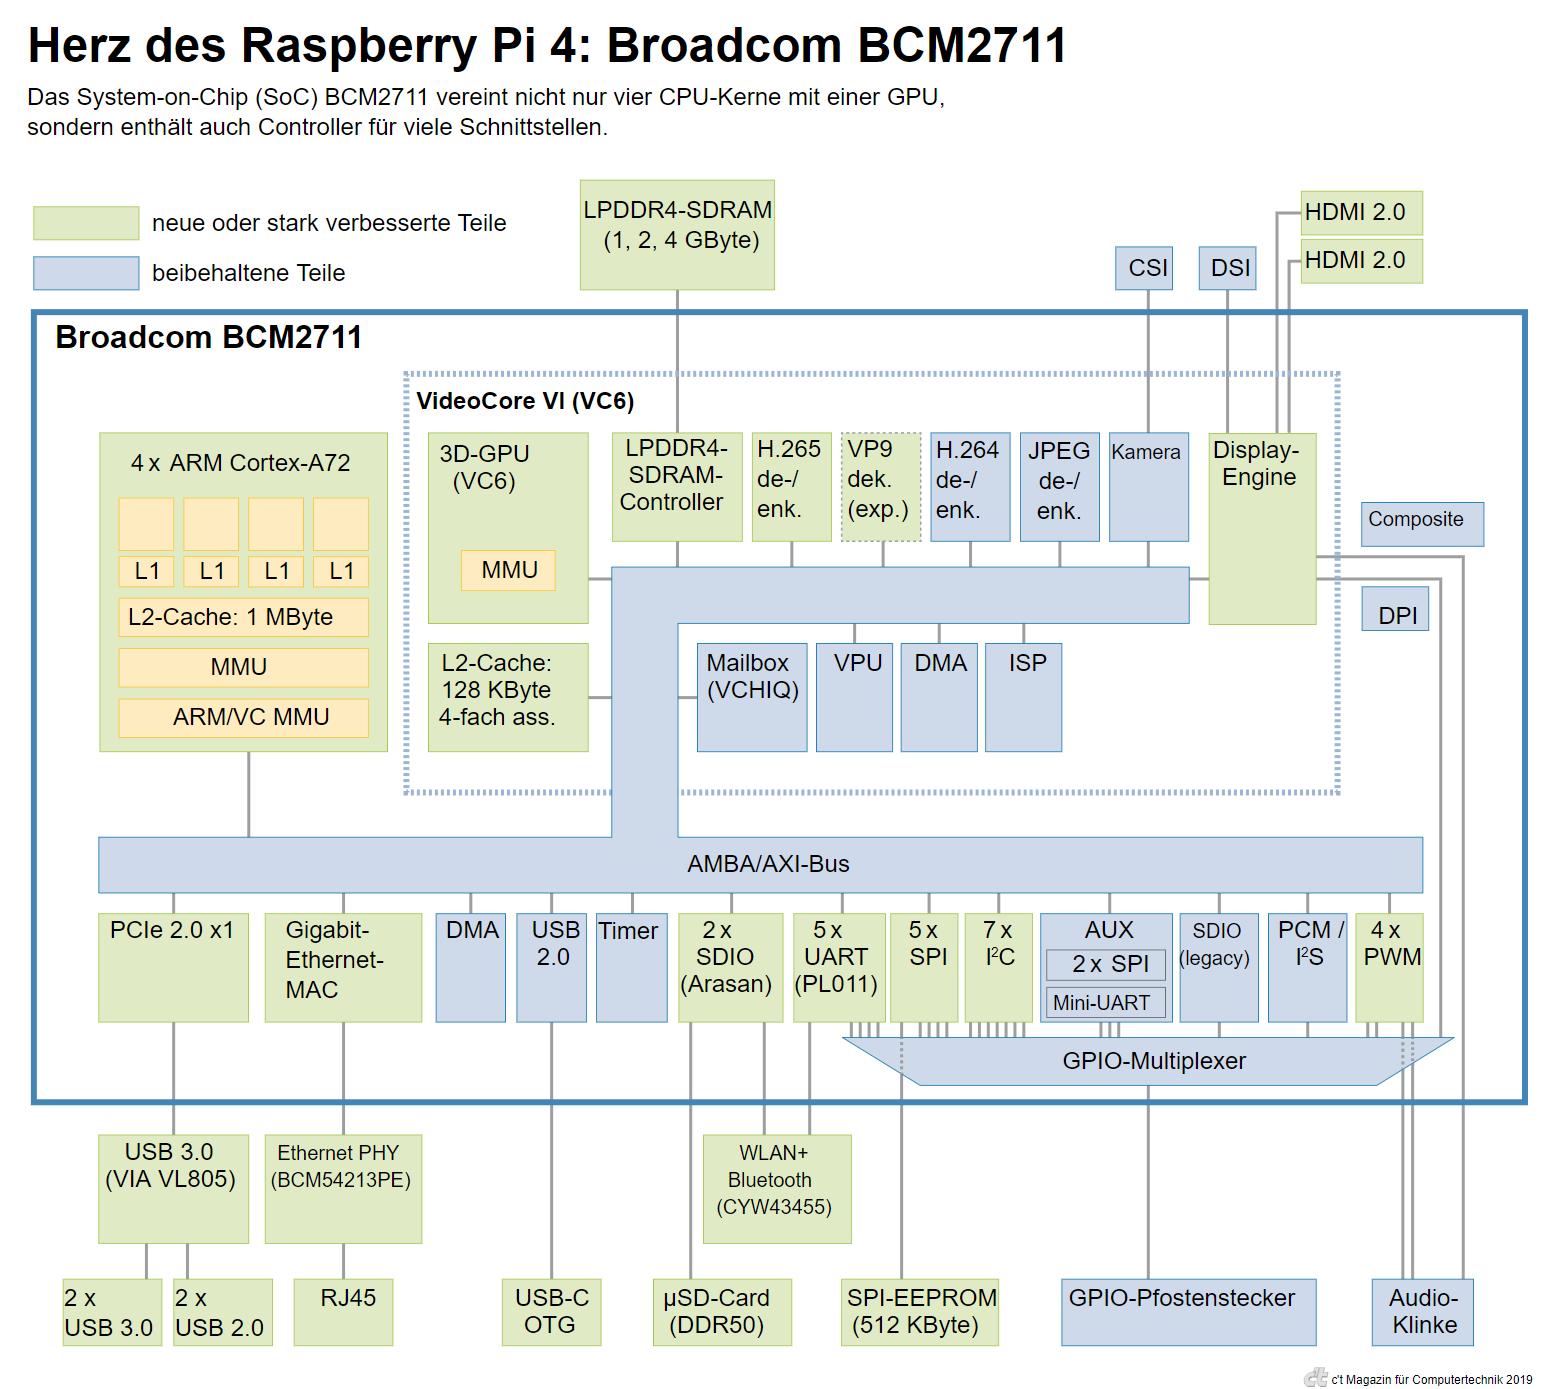 Raspberry Pi 4 Model B: Blockschaltbild des Broadcom BCM2711